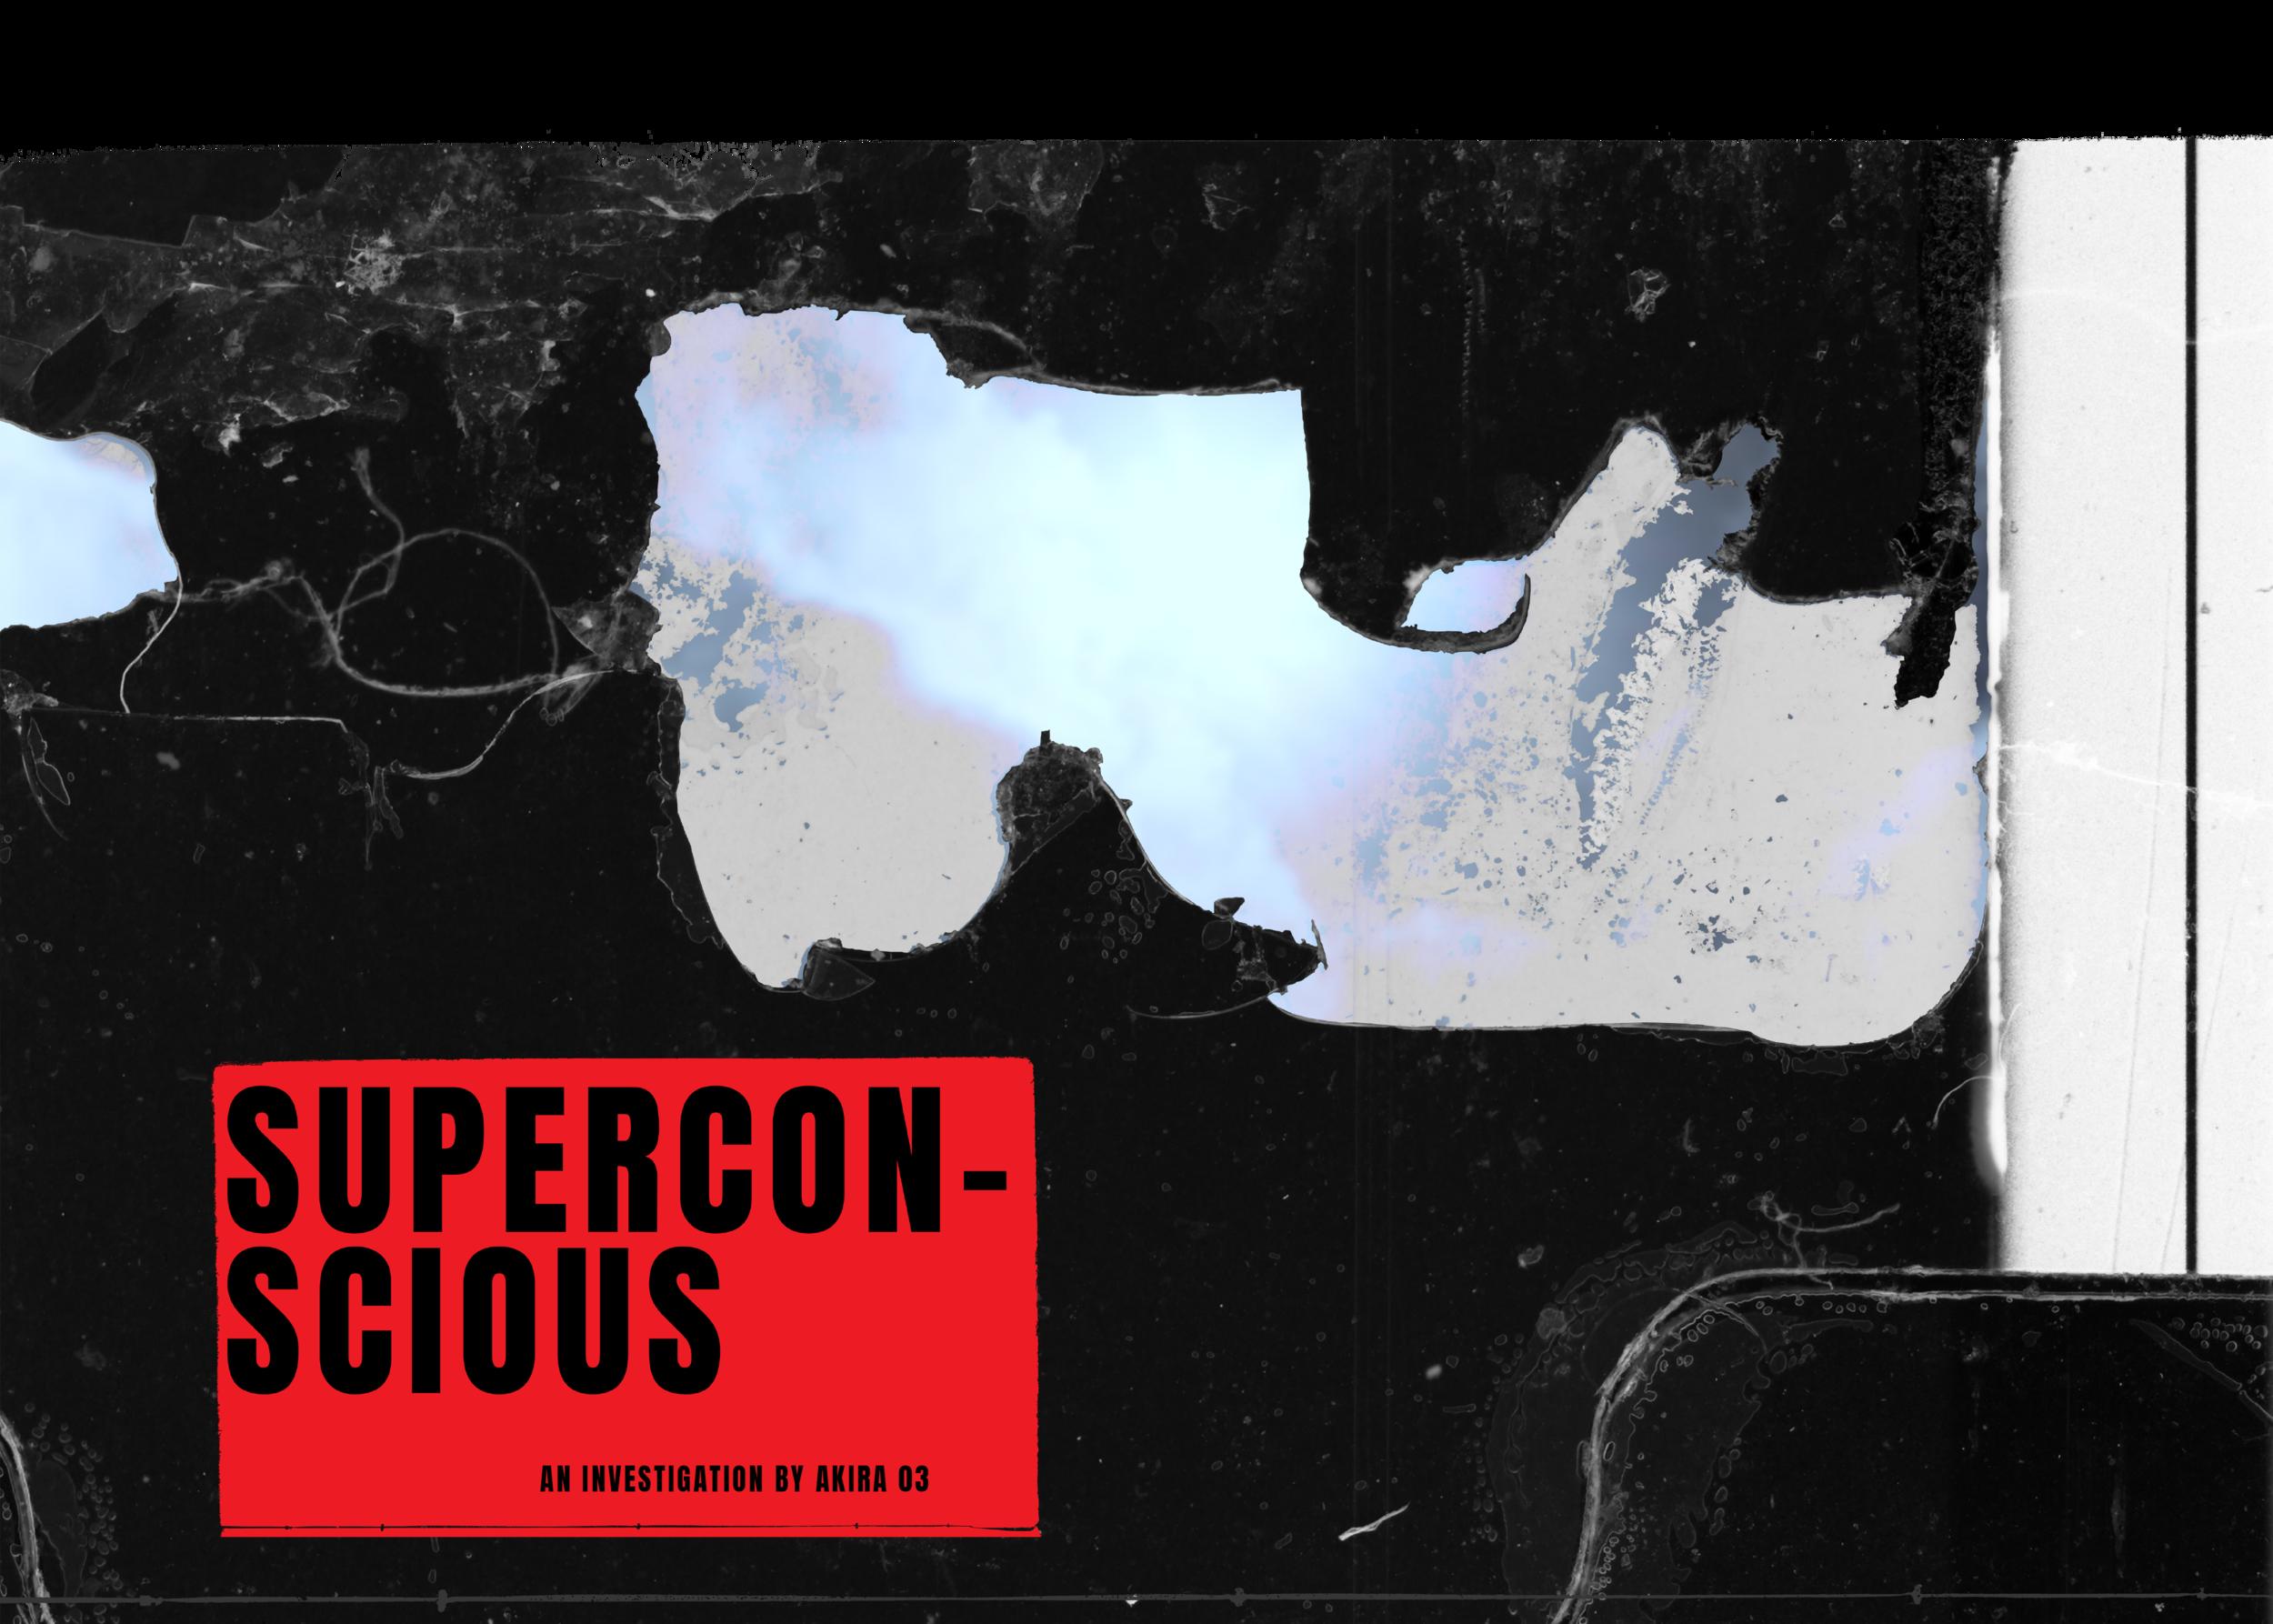 SUPERCONSCIOUS — AKIRA 03